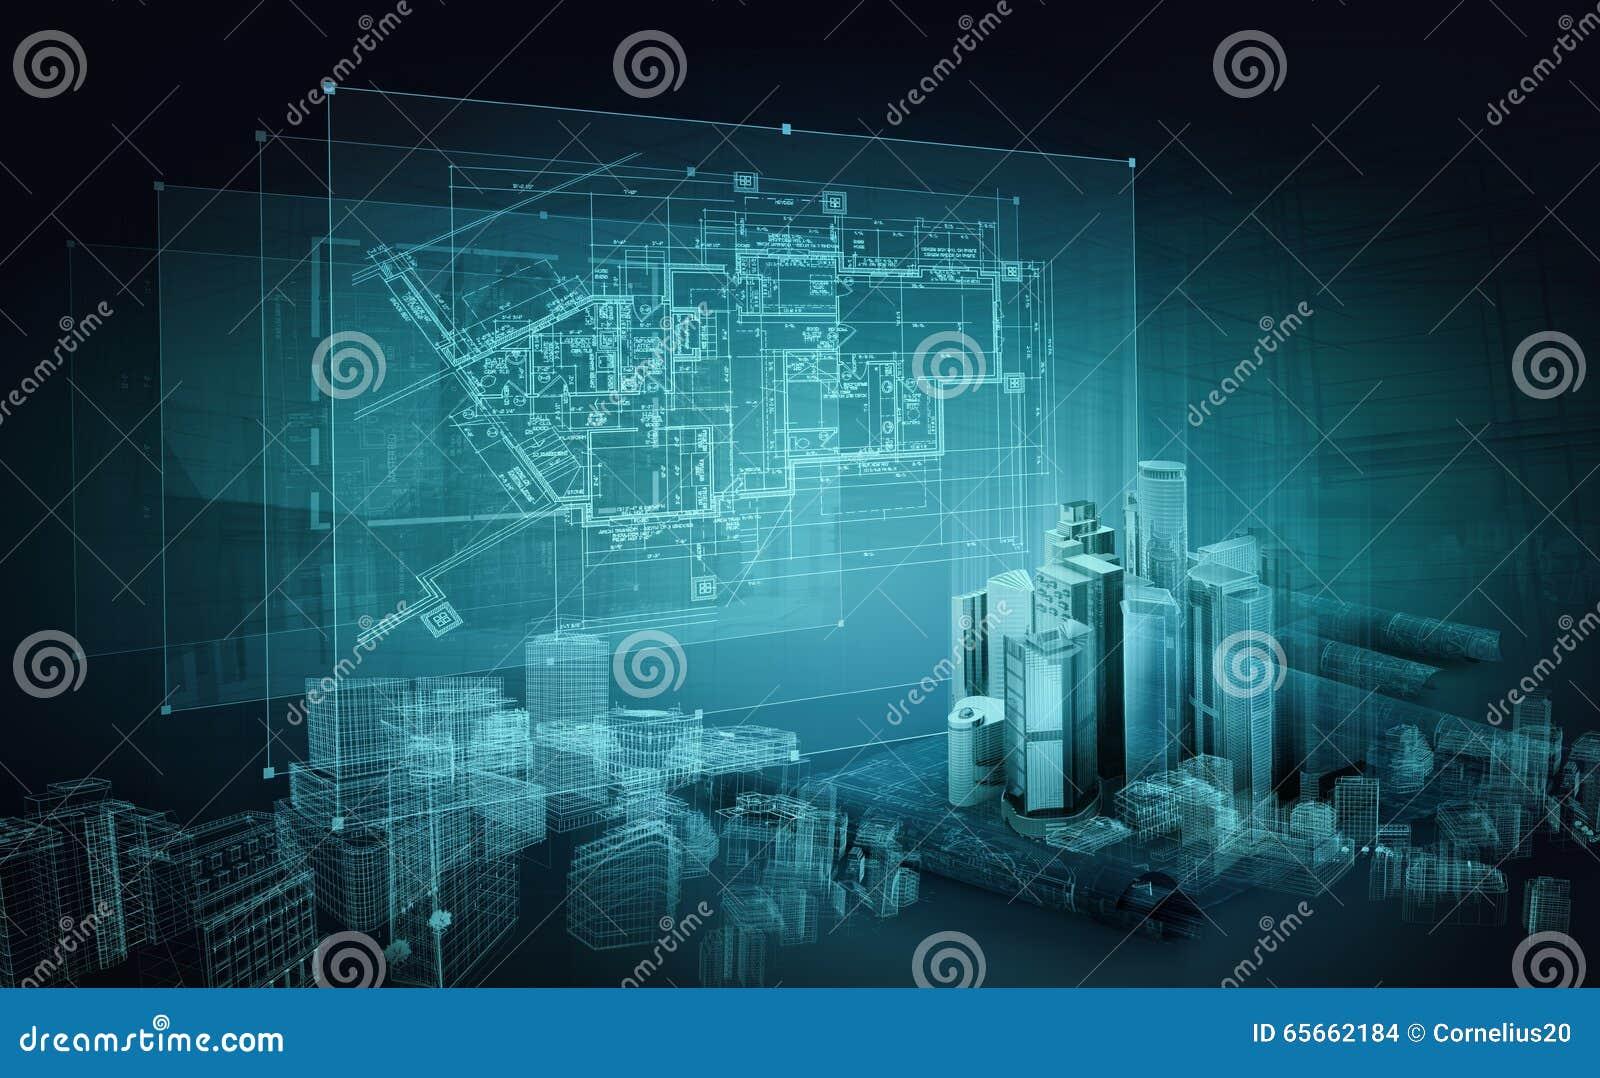 Architectural Project Construction Plan Blueprint